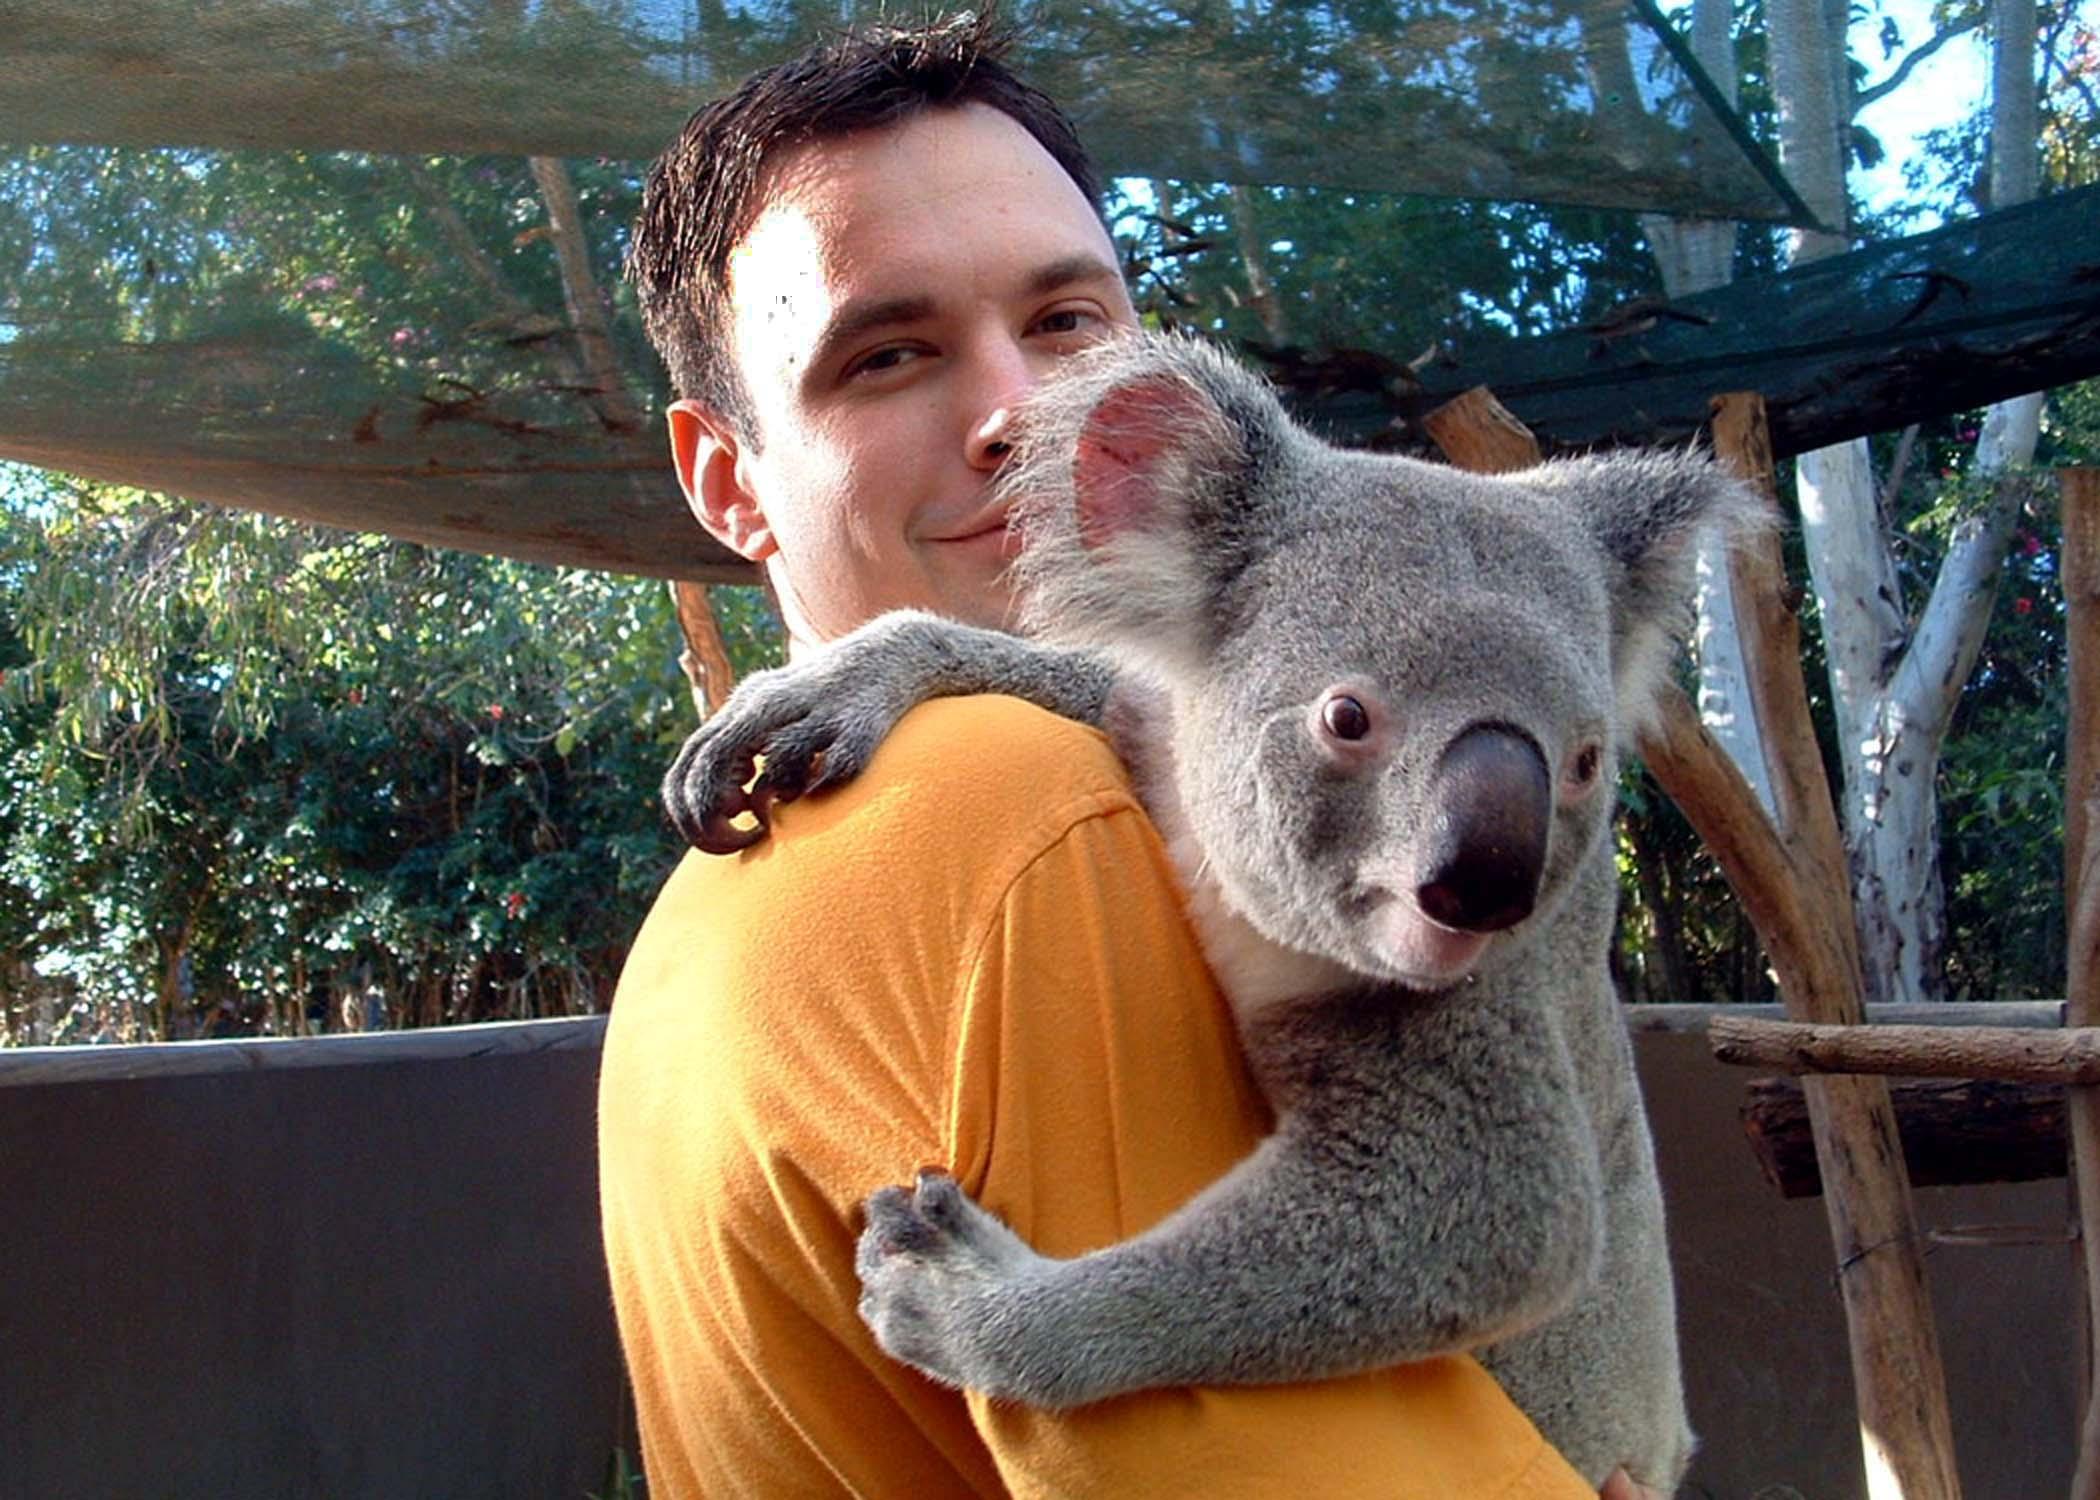 Koala Bear for Chinese Tourists